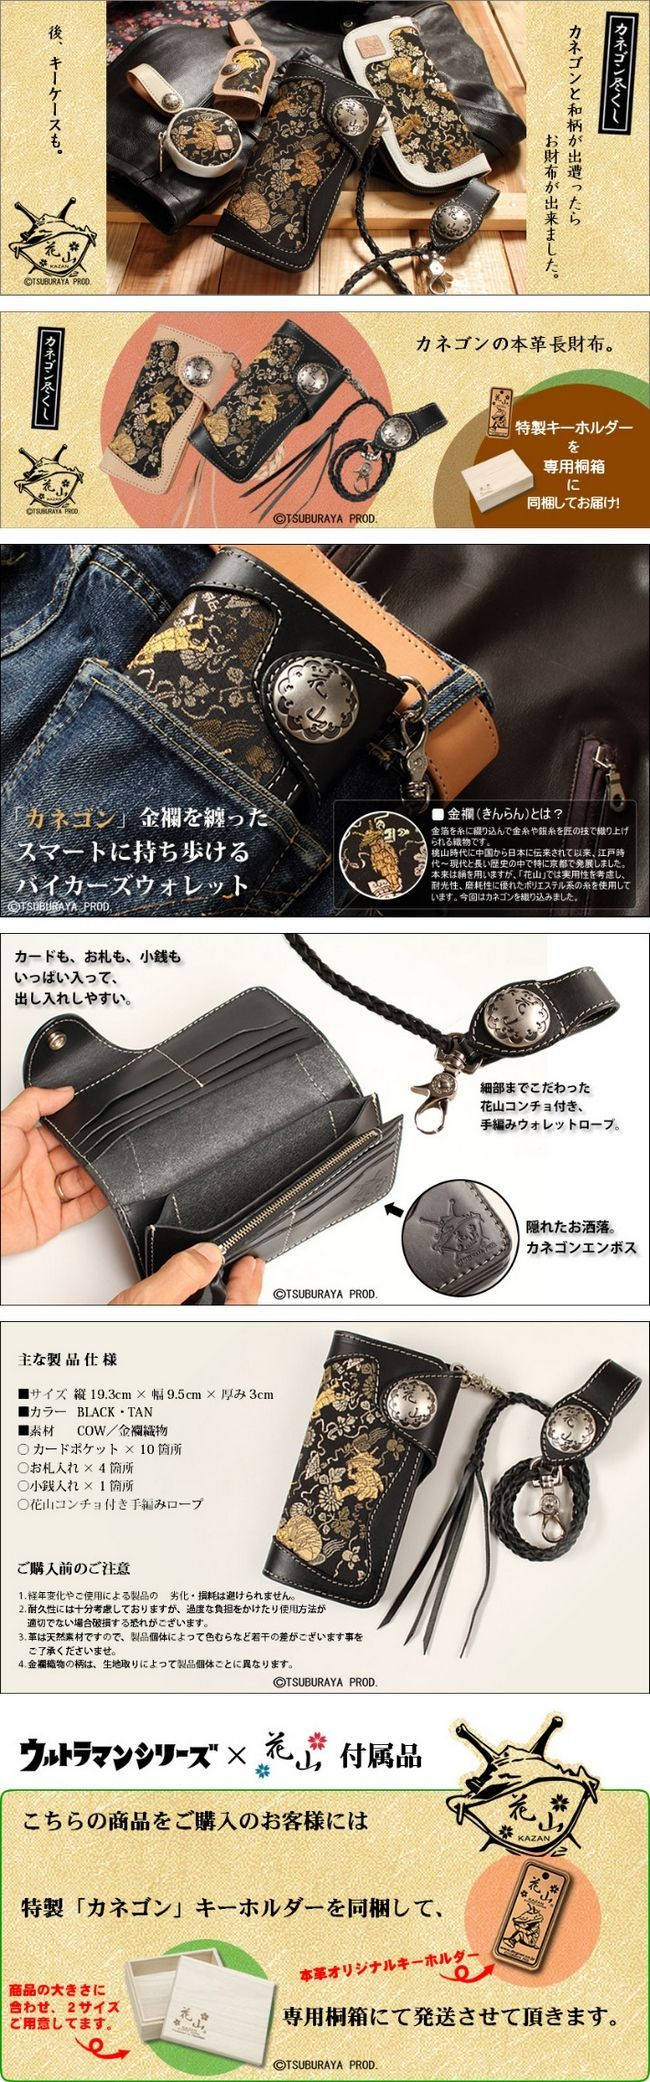 【DEGNER】Ultra SeriesX花山 皮革長錢包 - 「Webike-摩托百貨」